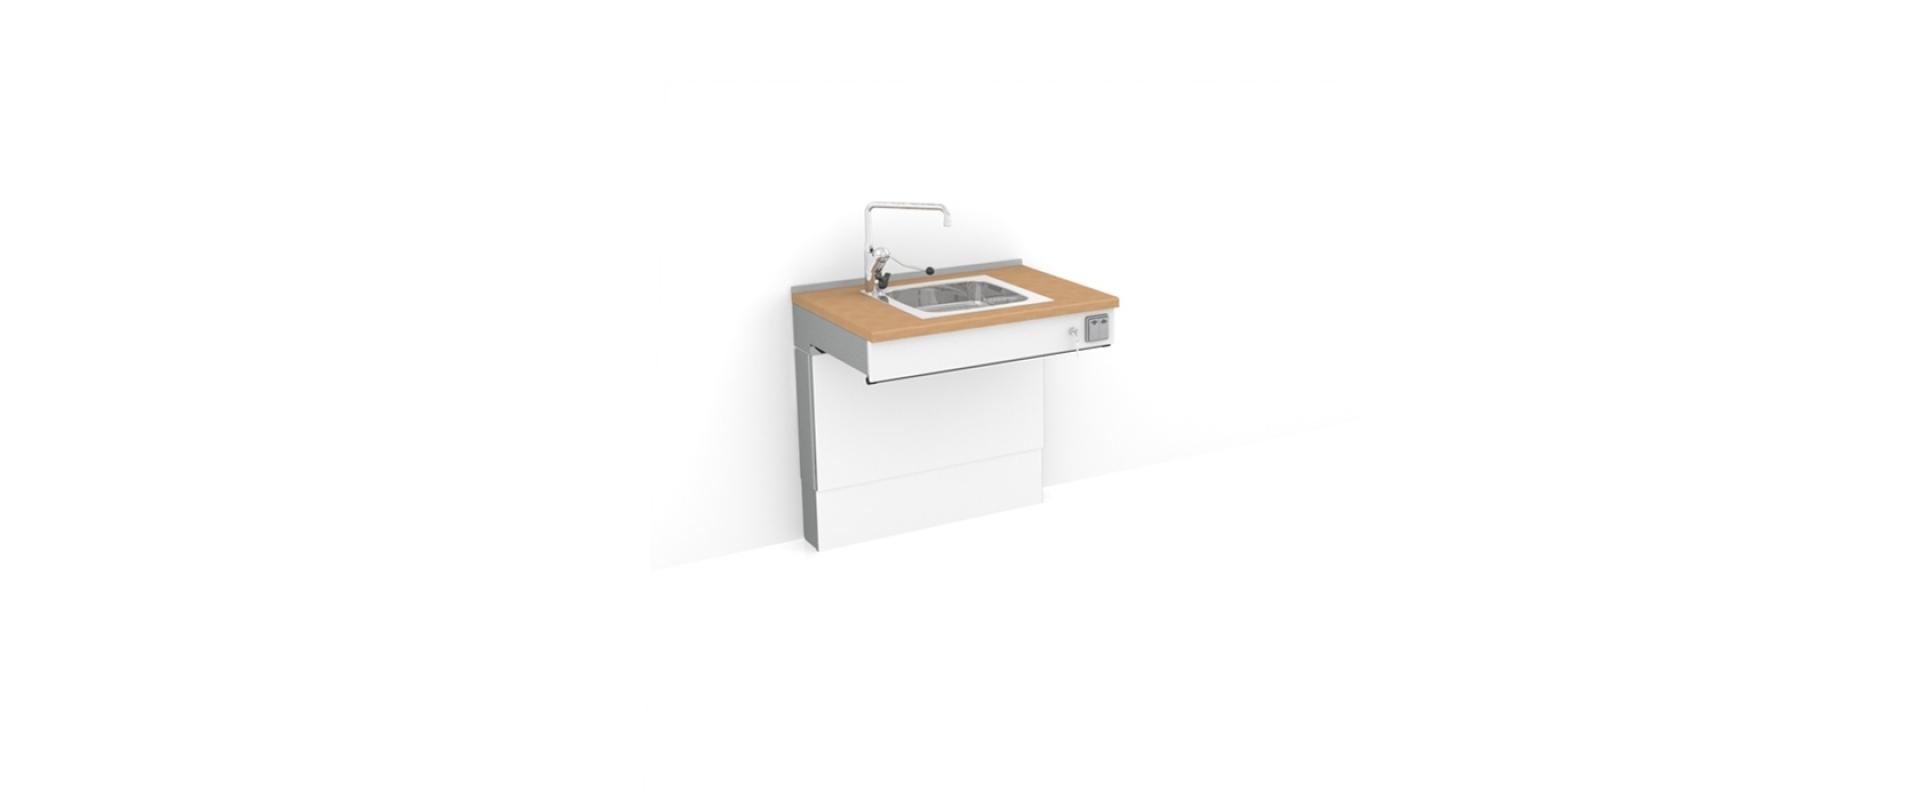 <b>Height adjustable sink 6300-ES10</b>